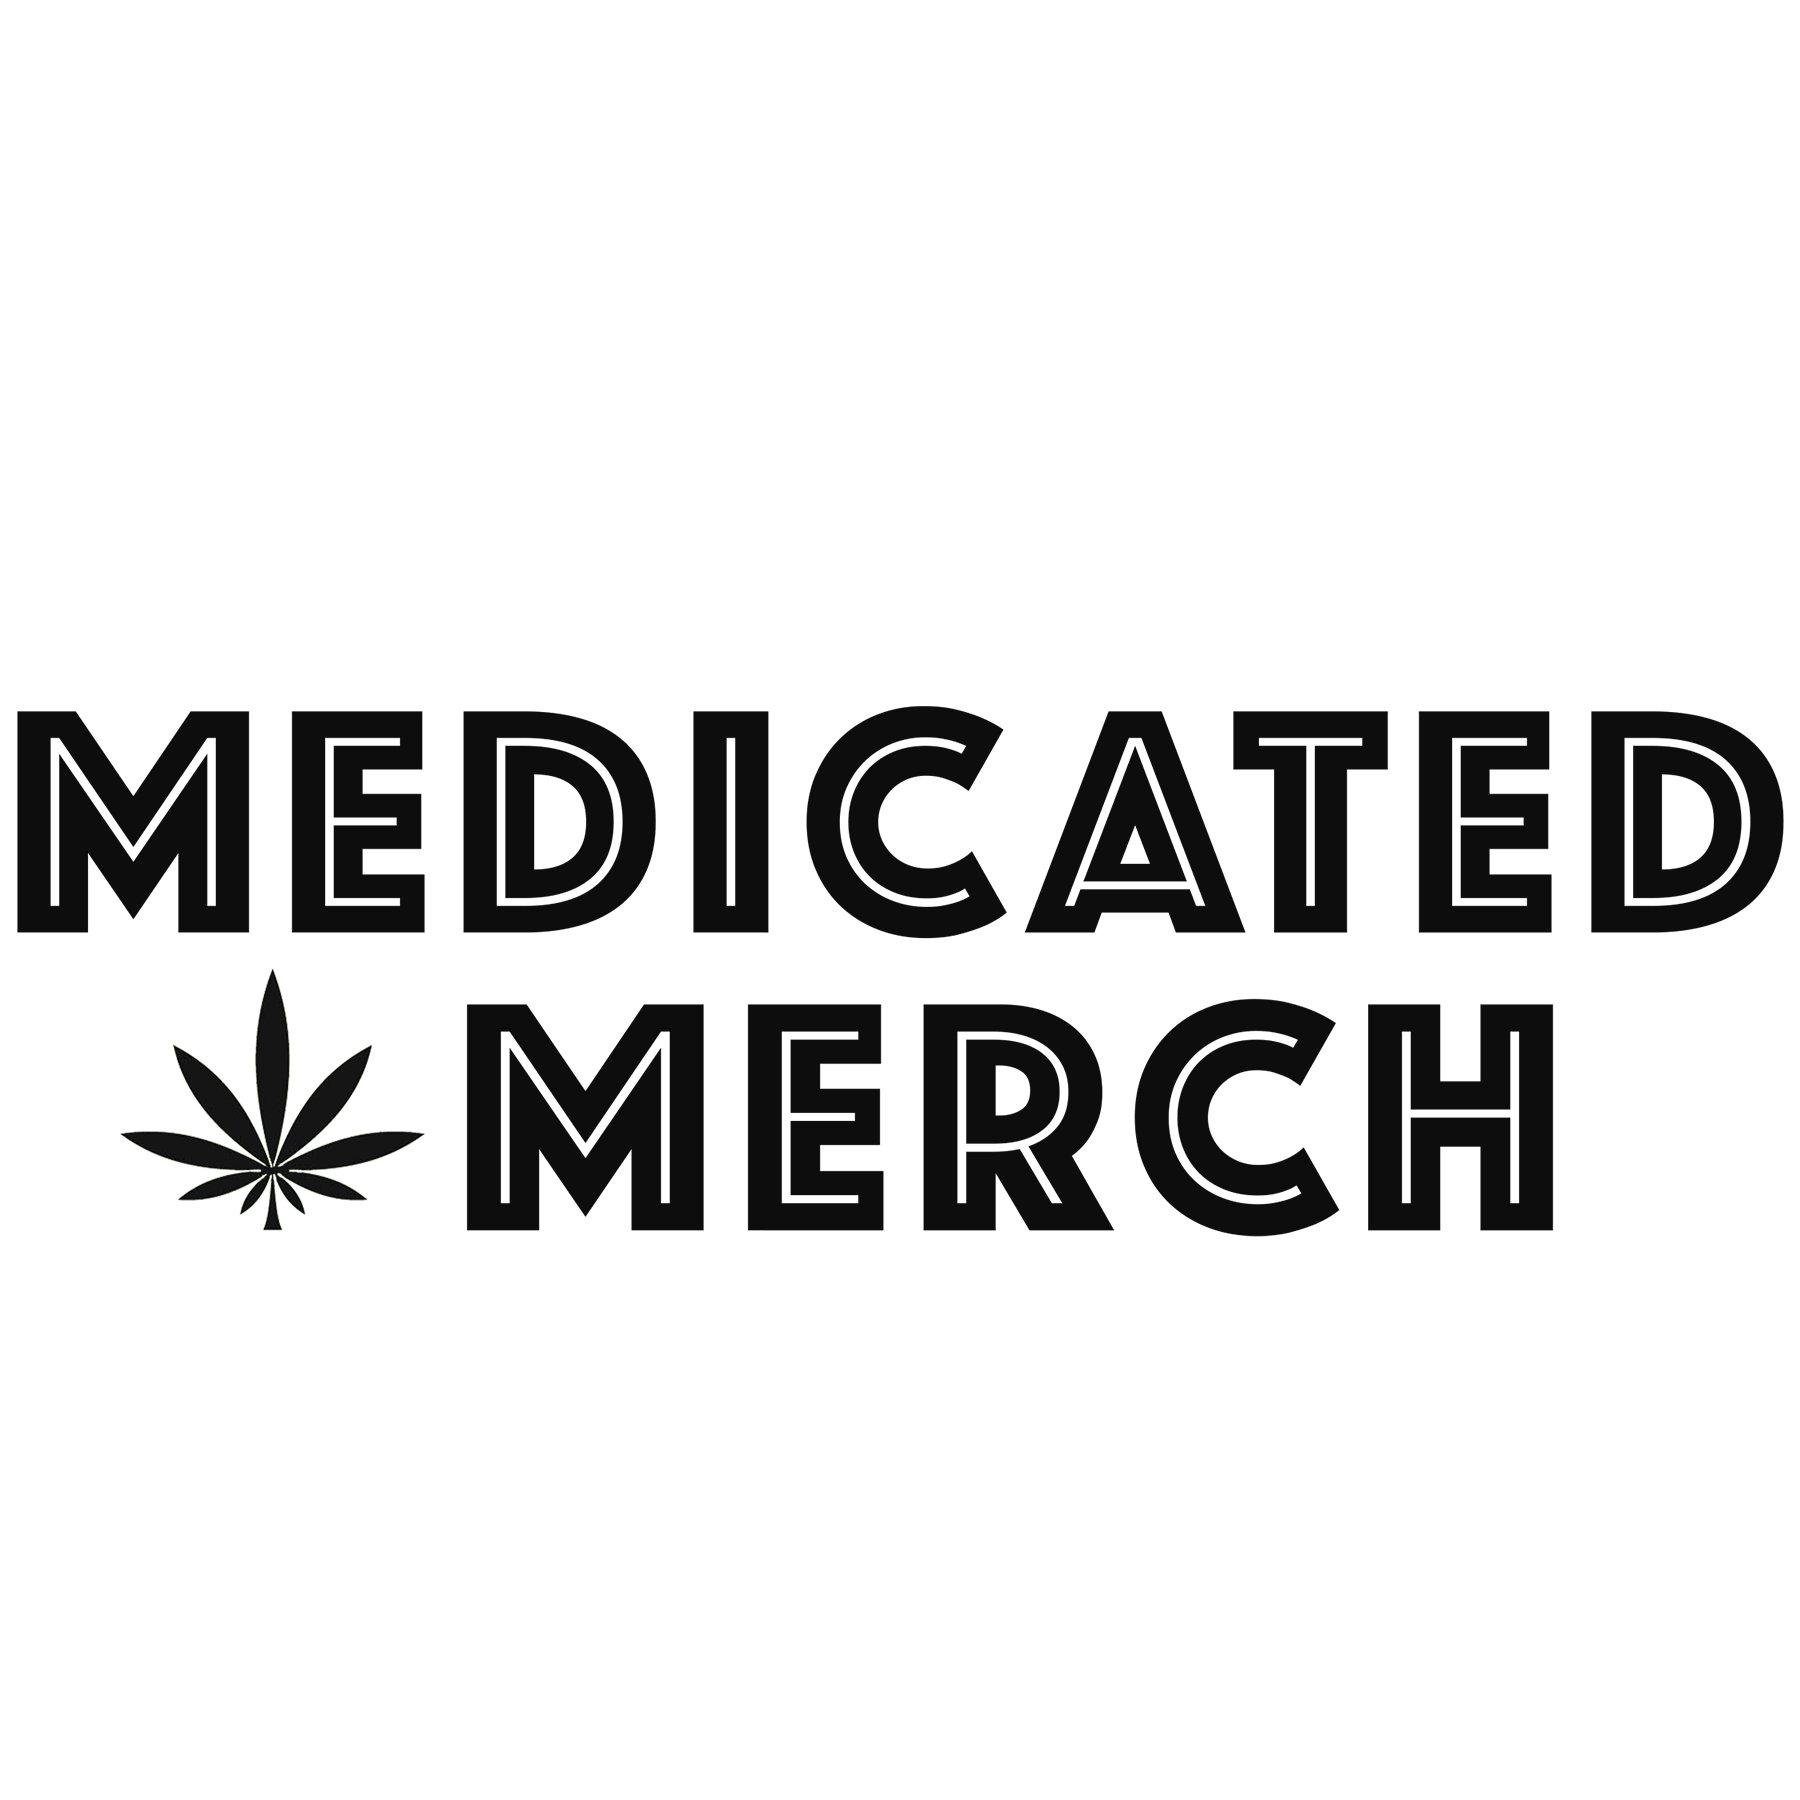 Medicated Merch